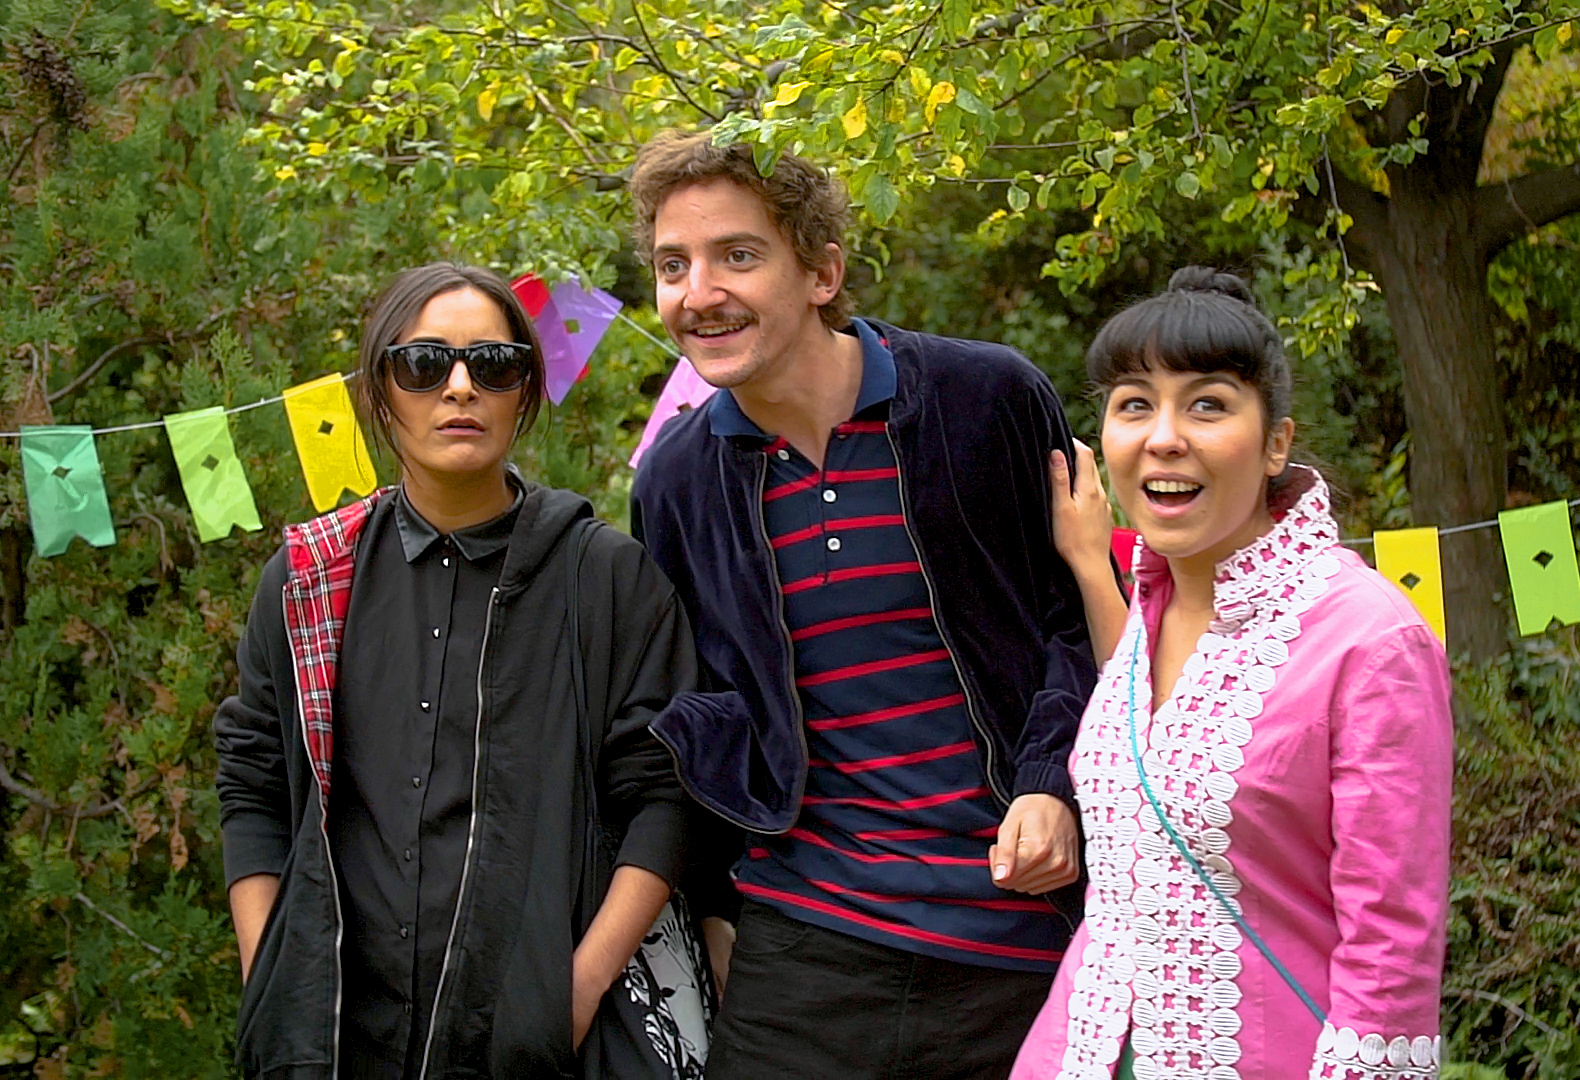 Amigx Basta! Miniserie web chilena de comedia sobre los millennials, llega a las plataformas digitales